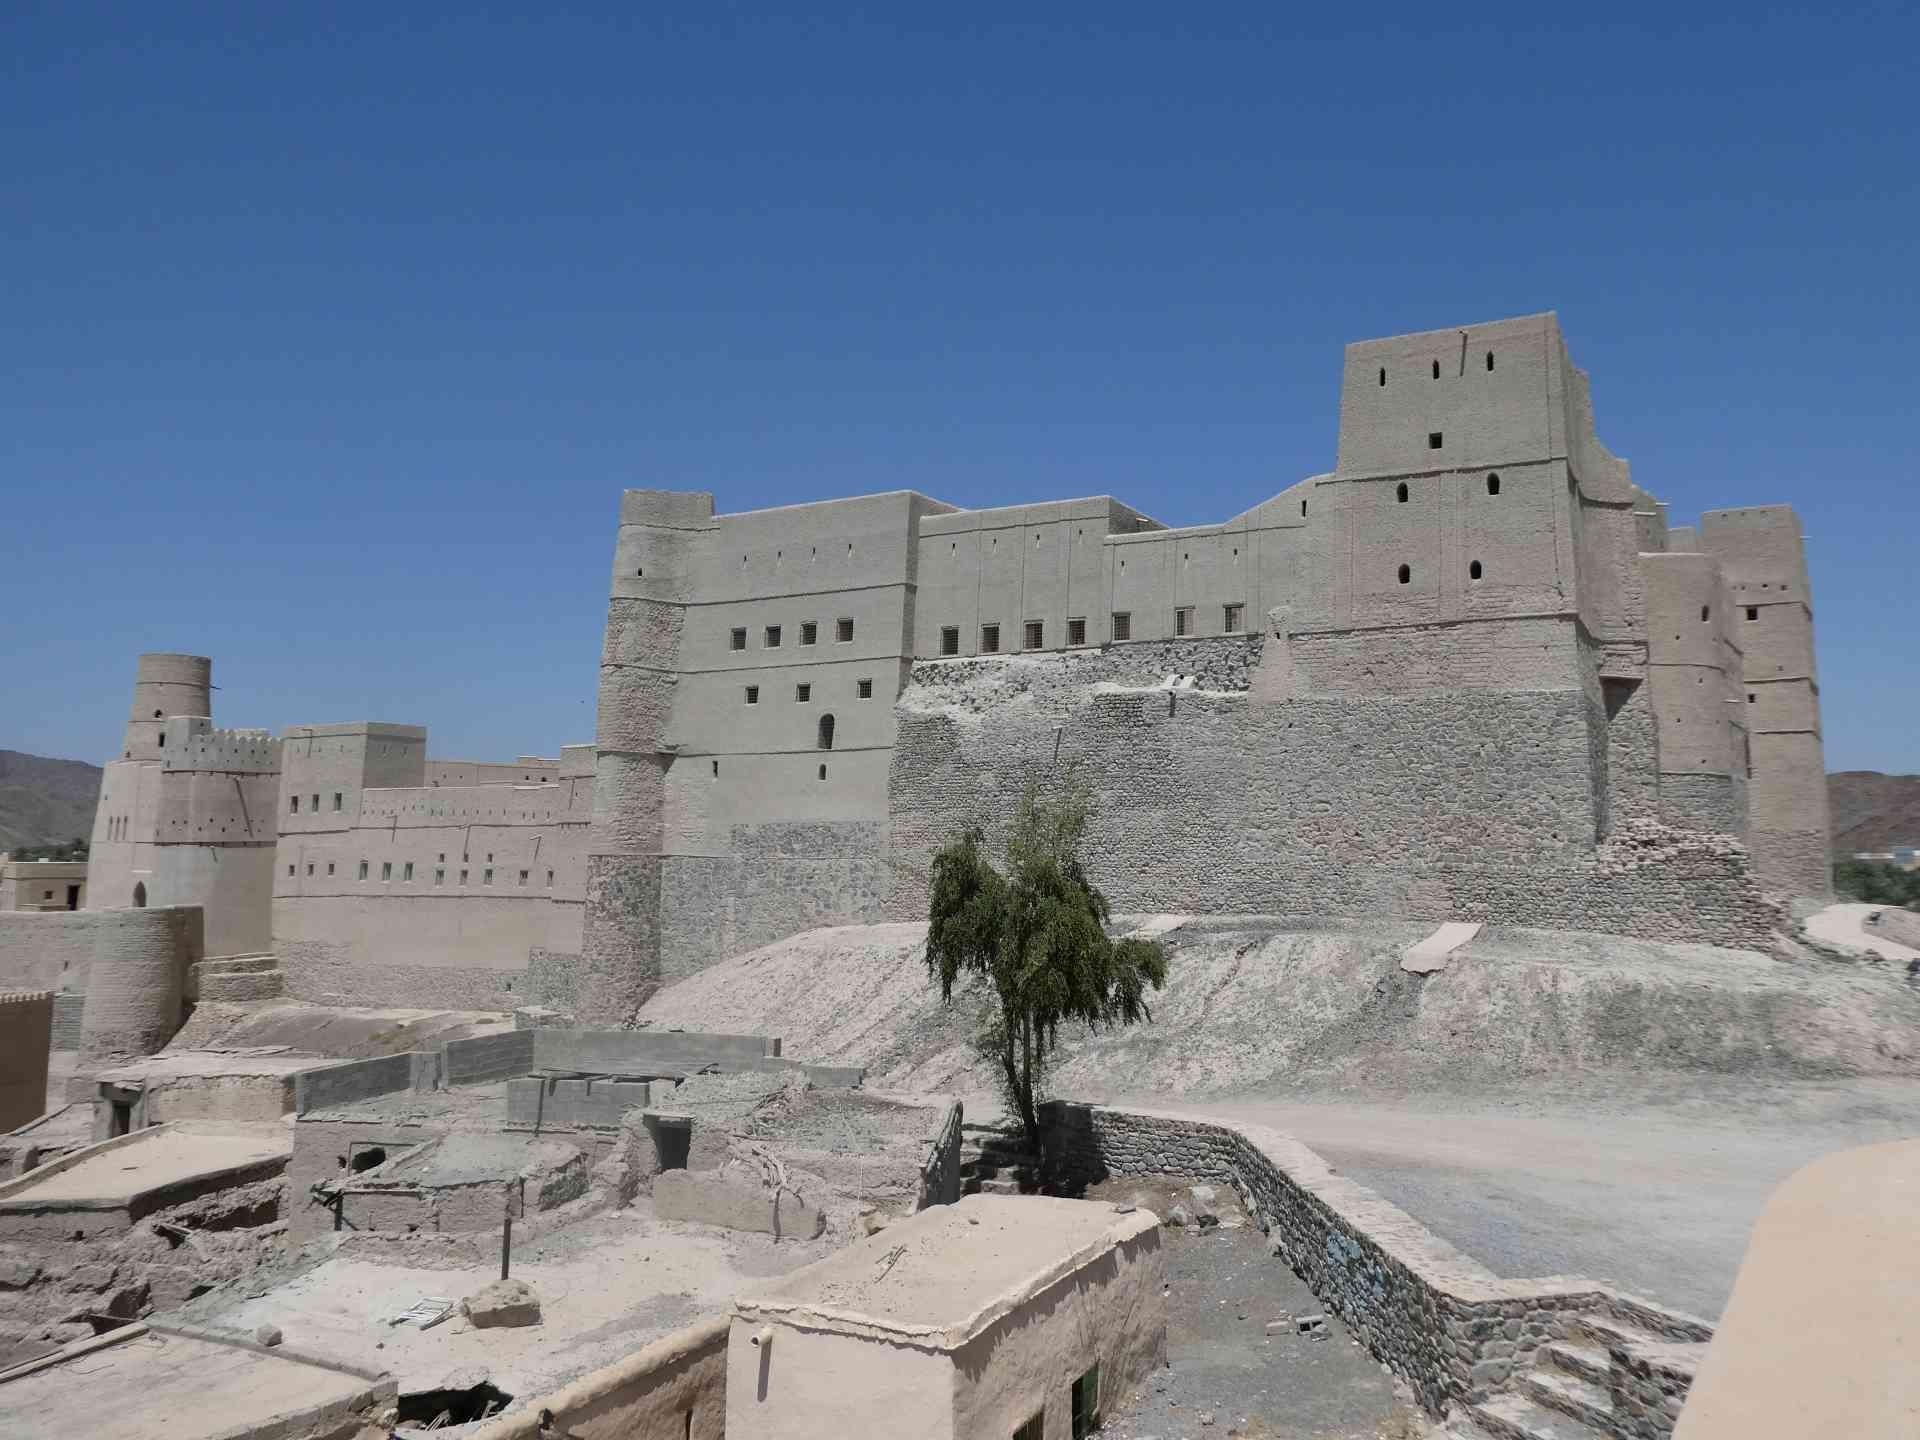 Bahla Oman, by Jeremy van Heerde